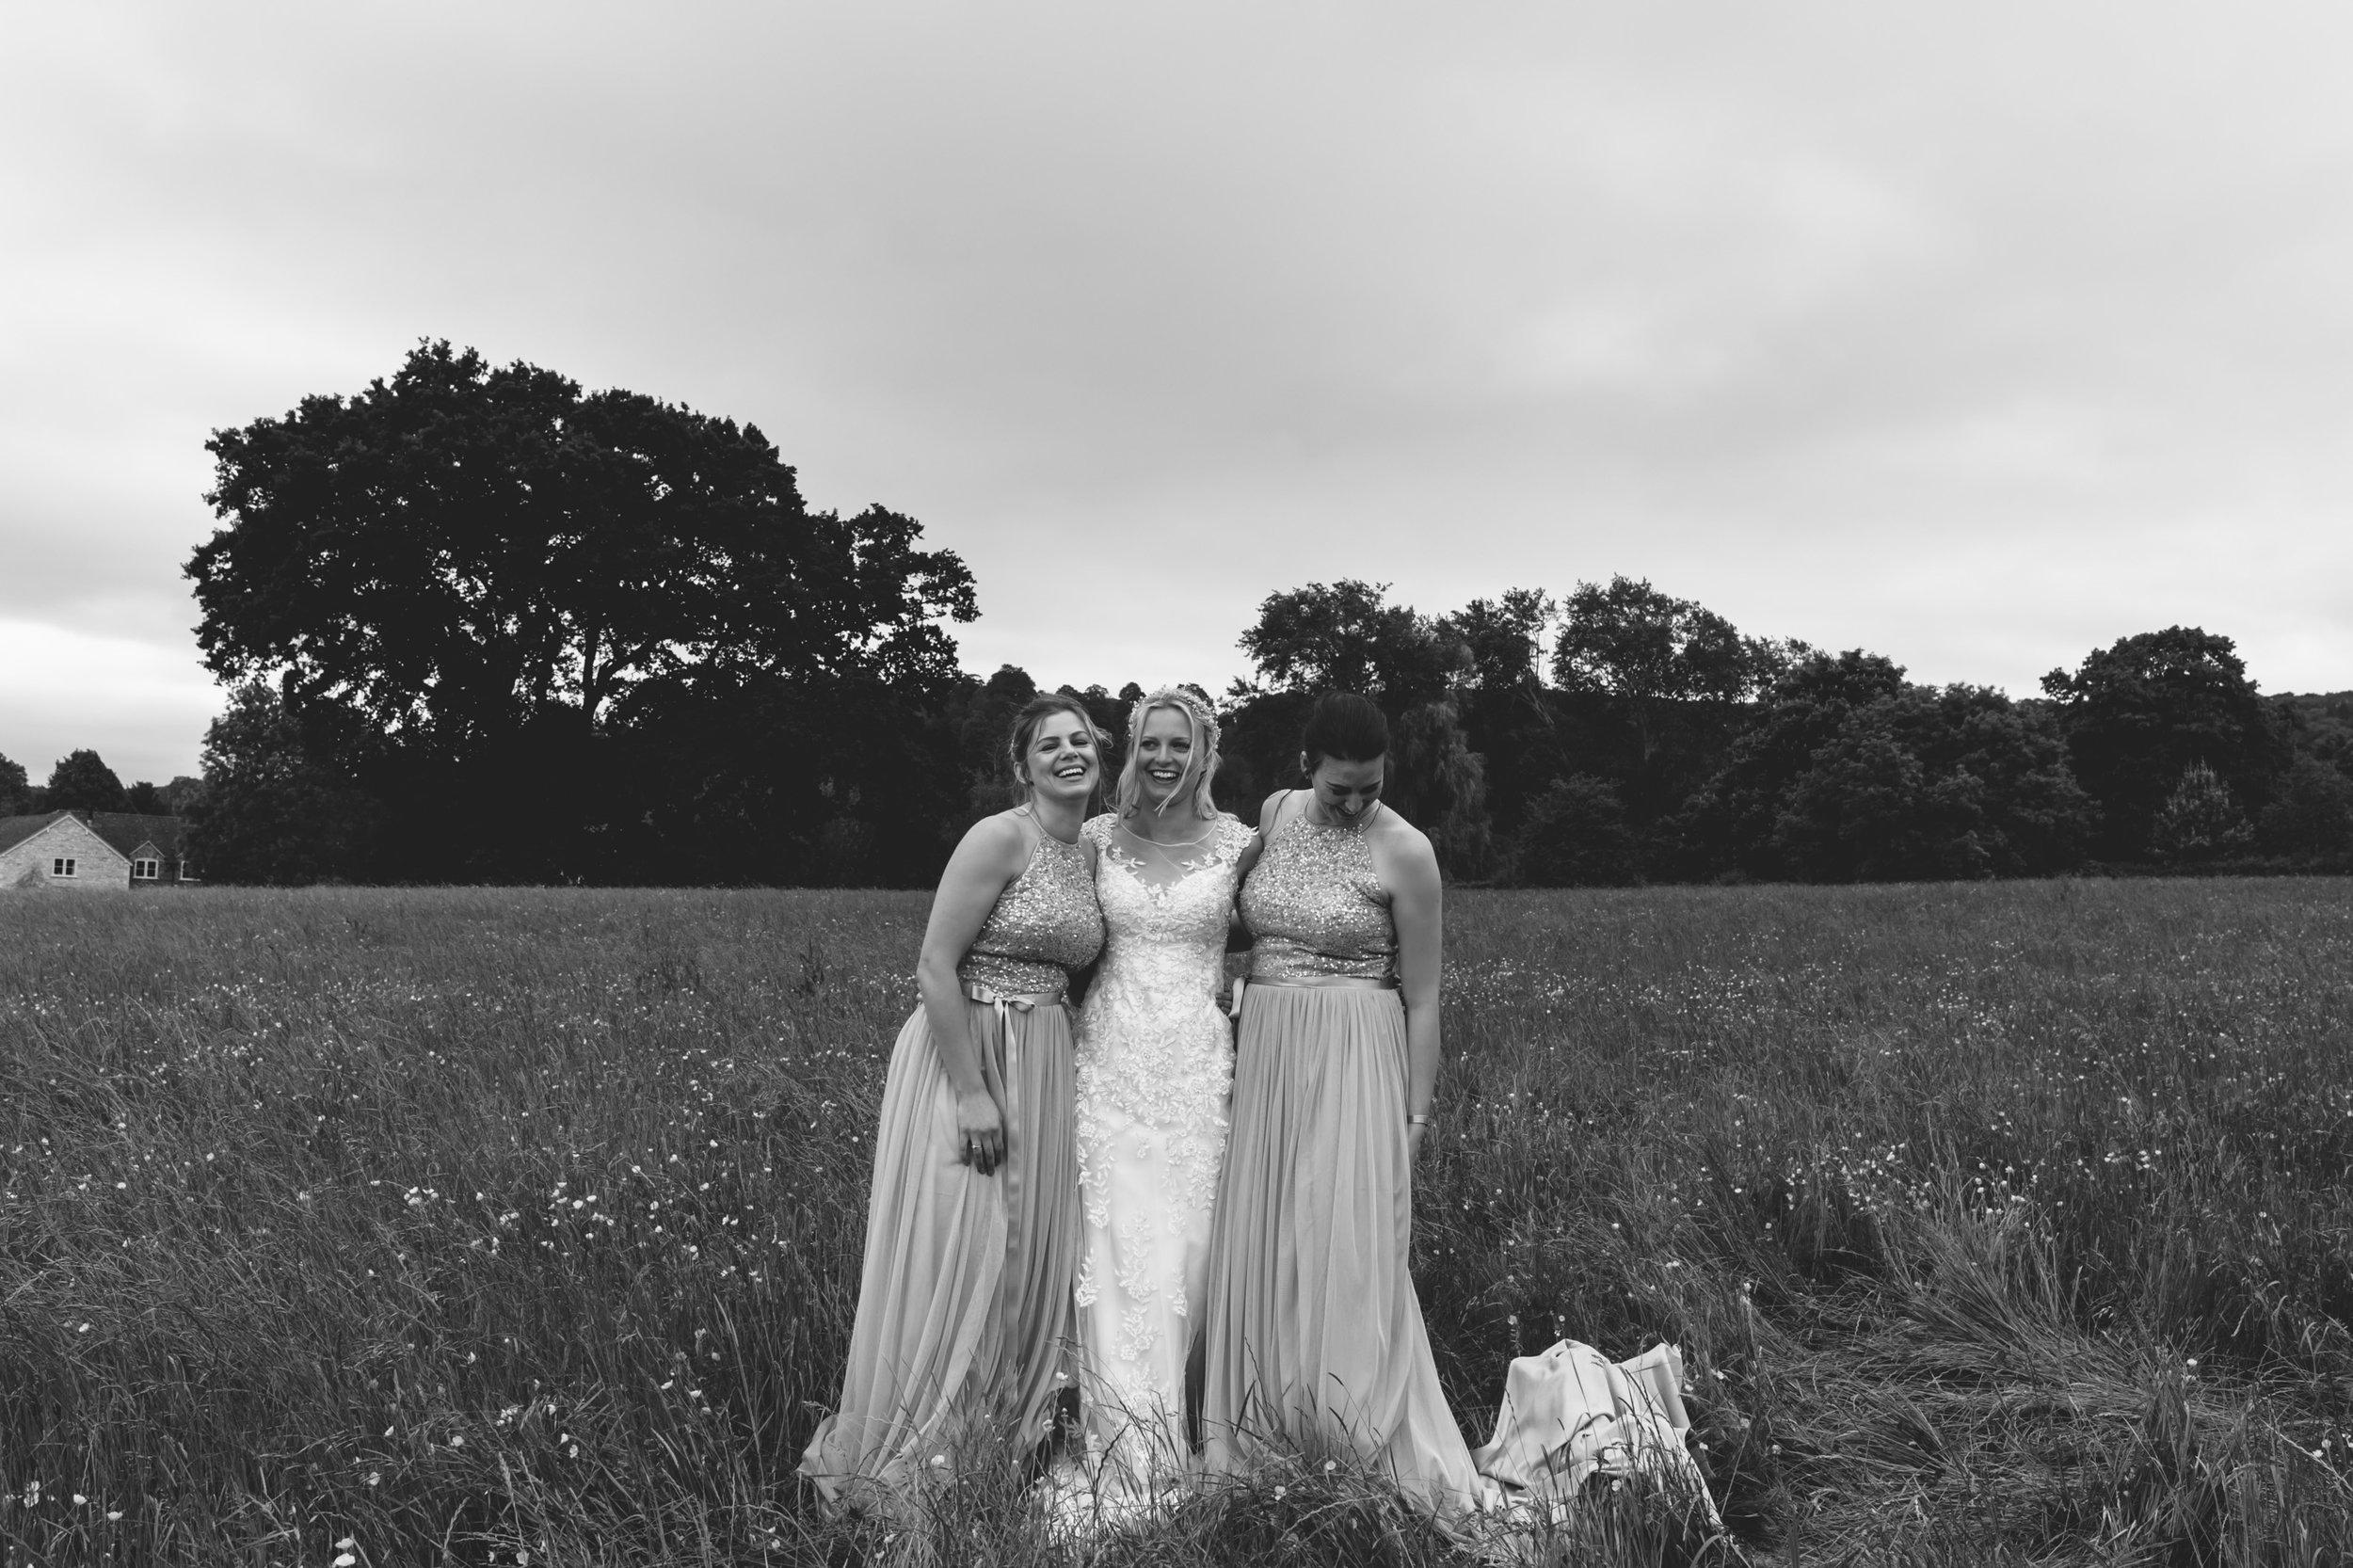 bridesmaids Birmingham photographer wedding country artistic wedding photography29.jpg